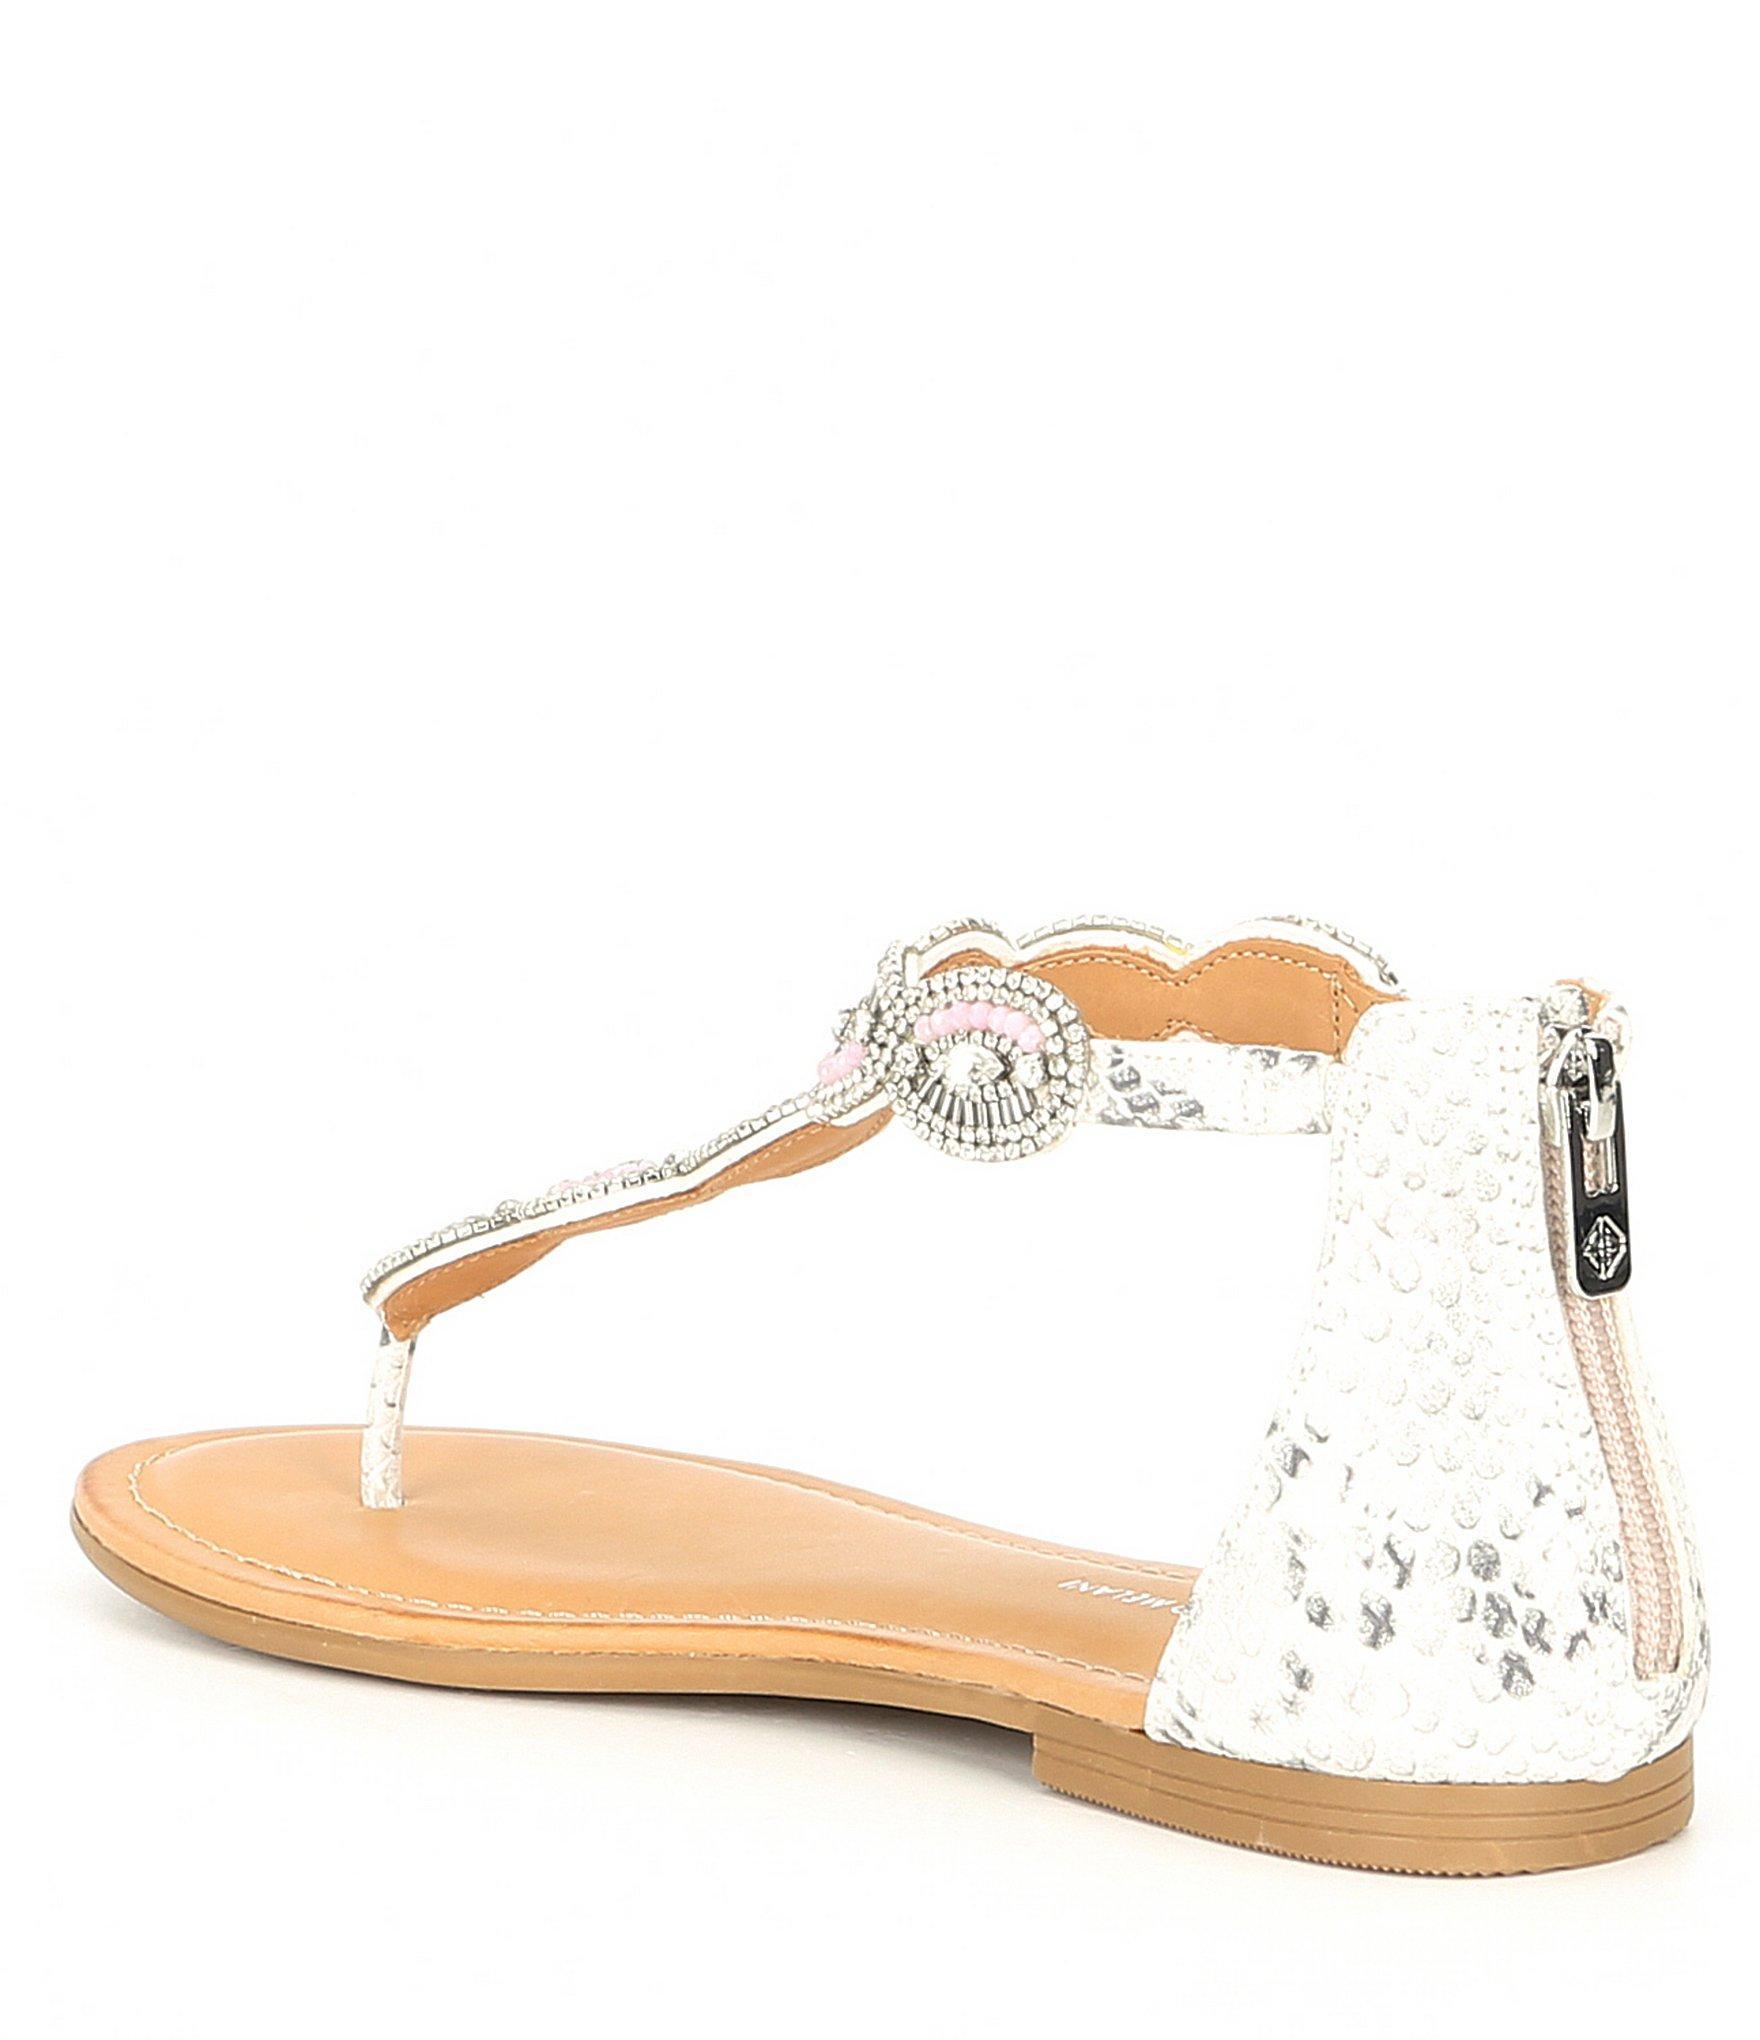 8f279393c7f1 Antonio Melani - Multicolor Lillio Foiled Metallic Leather Thong Sandals -  Lyst. View fullscreen